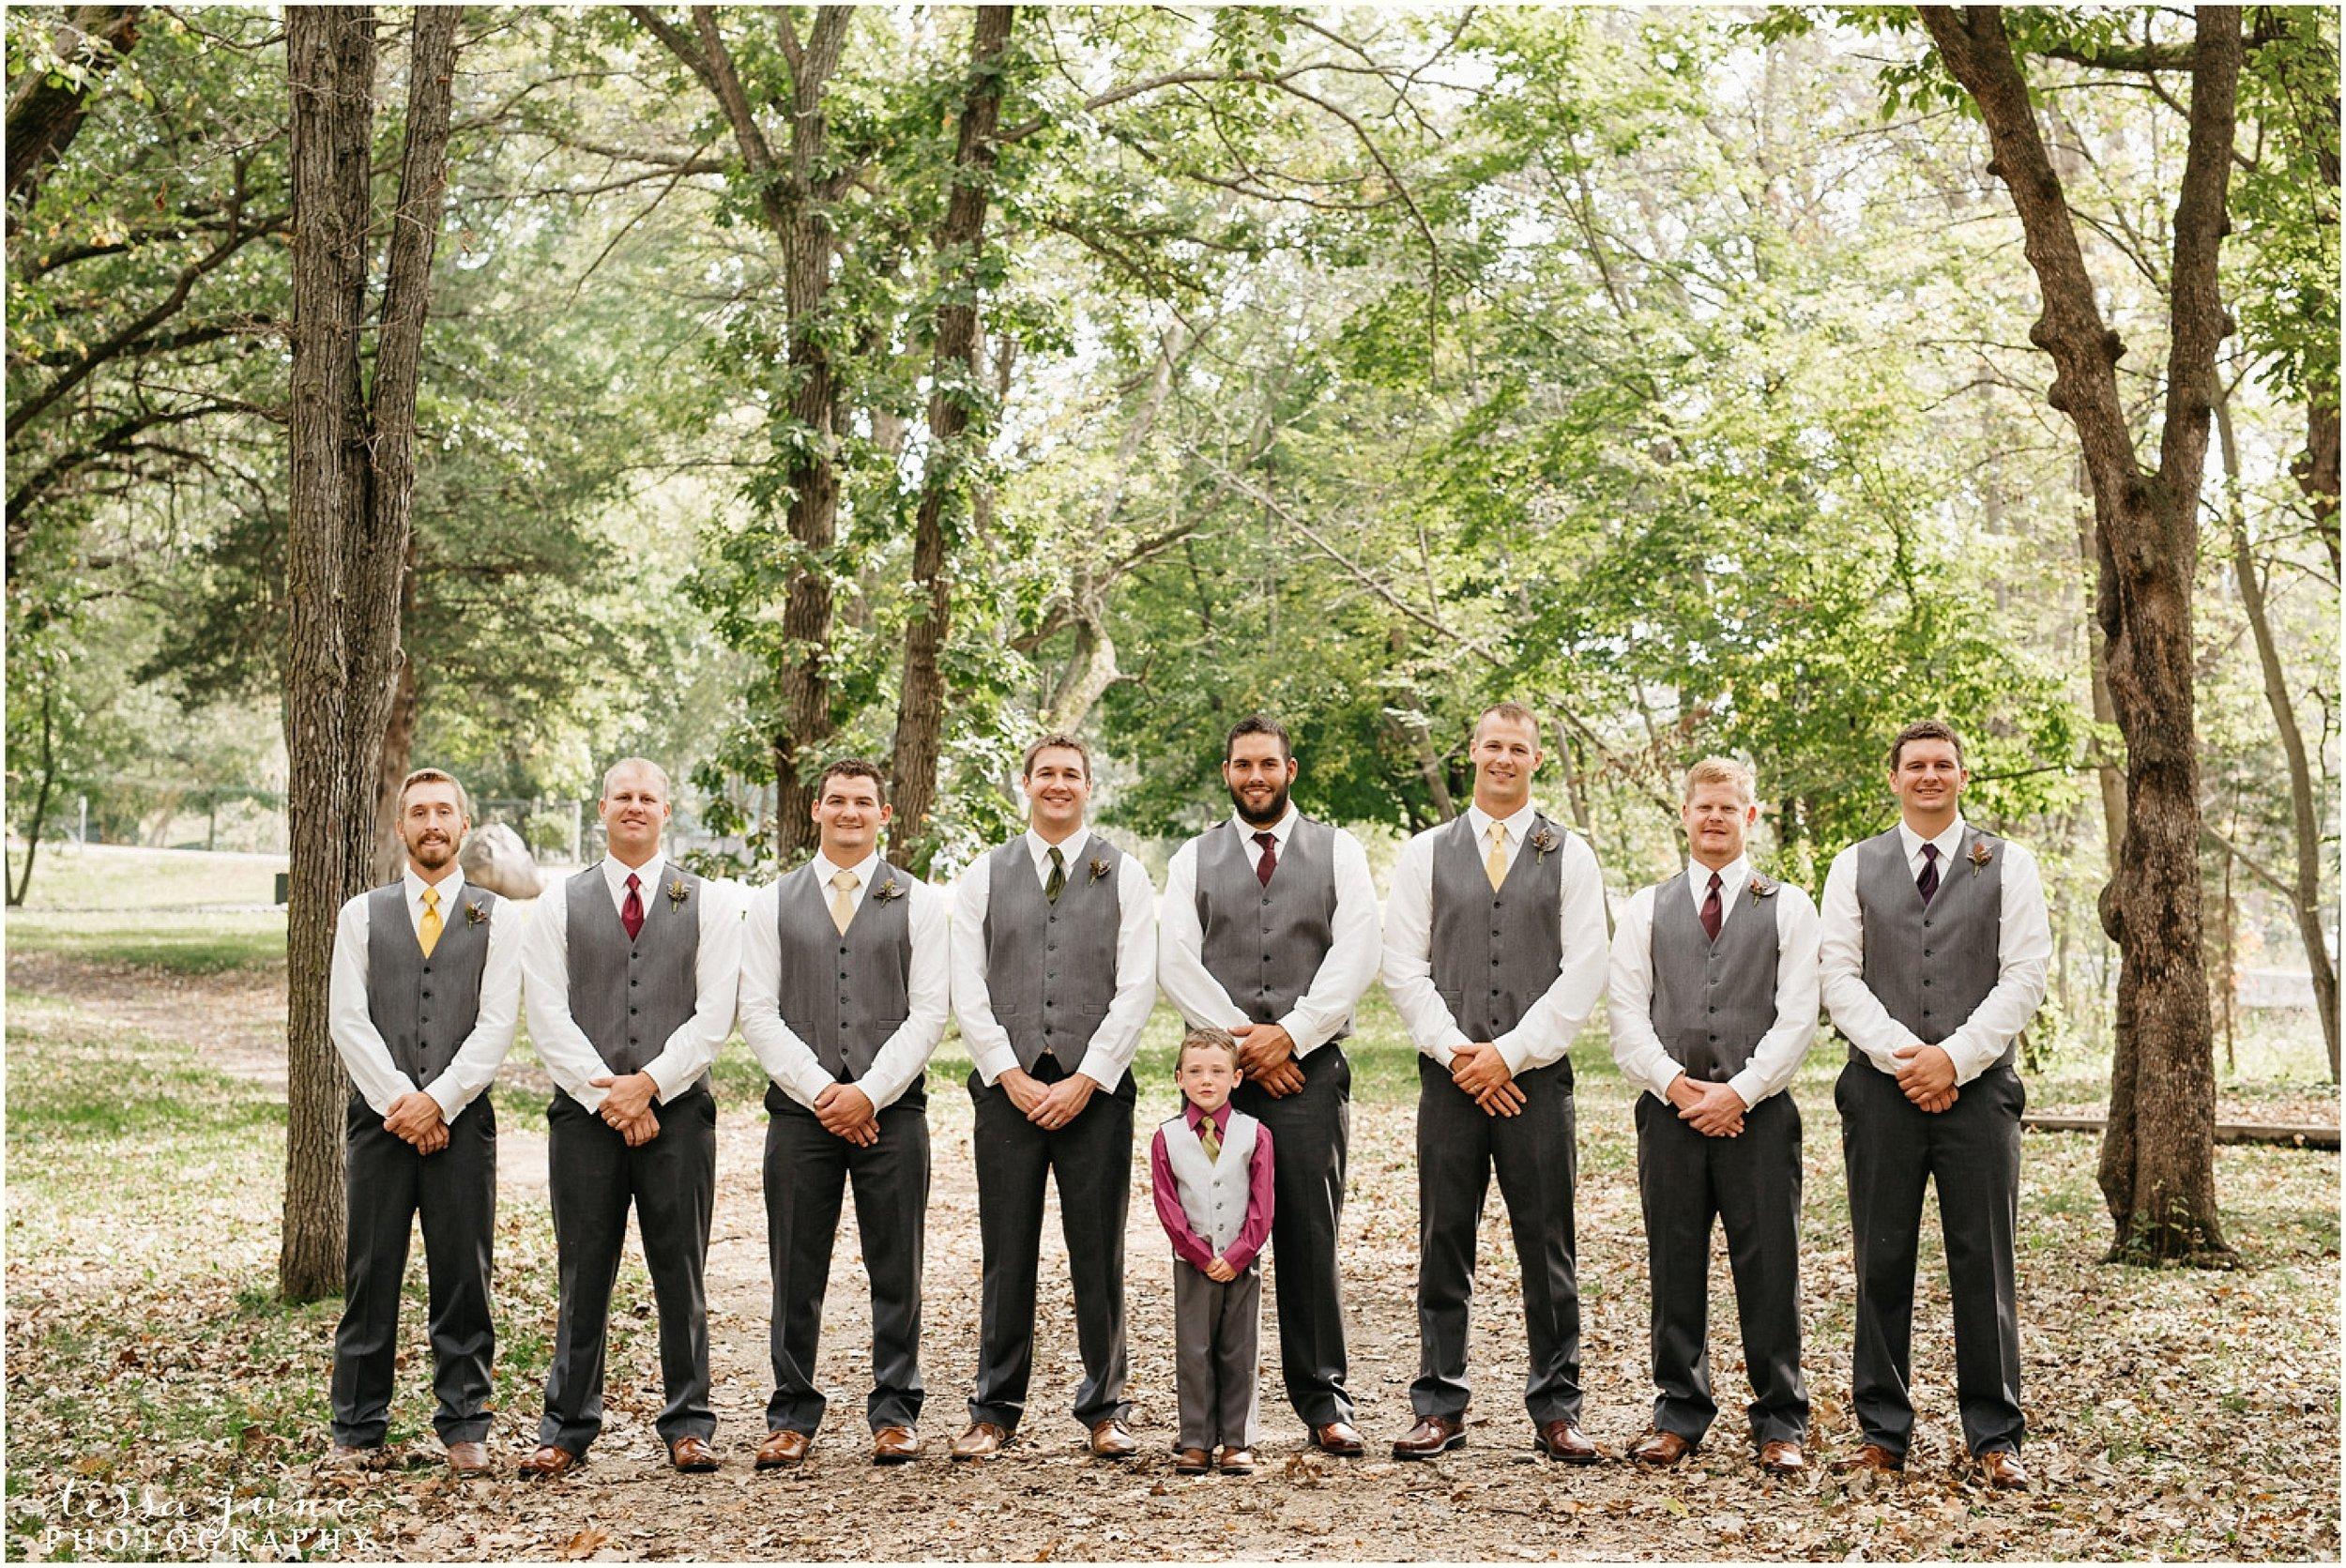 bohemian-minnesota-wedding-mismatched-bridesmaid-dresses-waterfall-st-cloud-tessa-june-photography-82.jpg